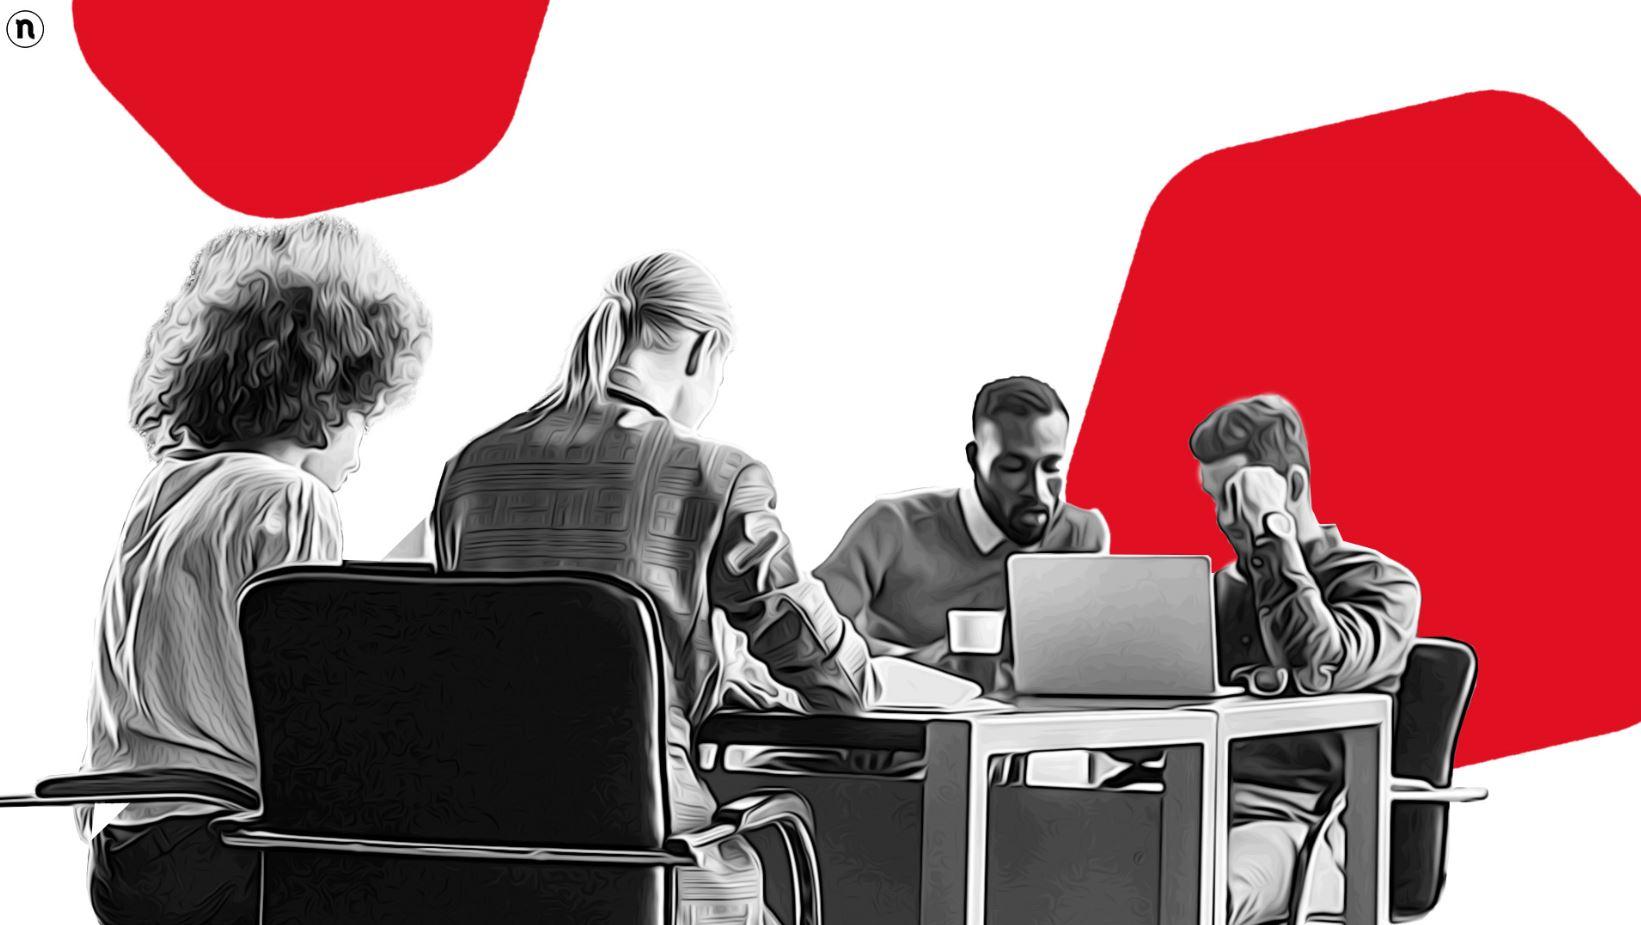 Openroom, Cuely e T-Minus: i digital tool della settimana